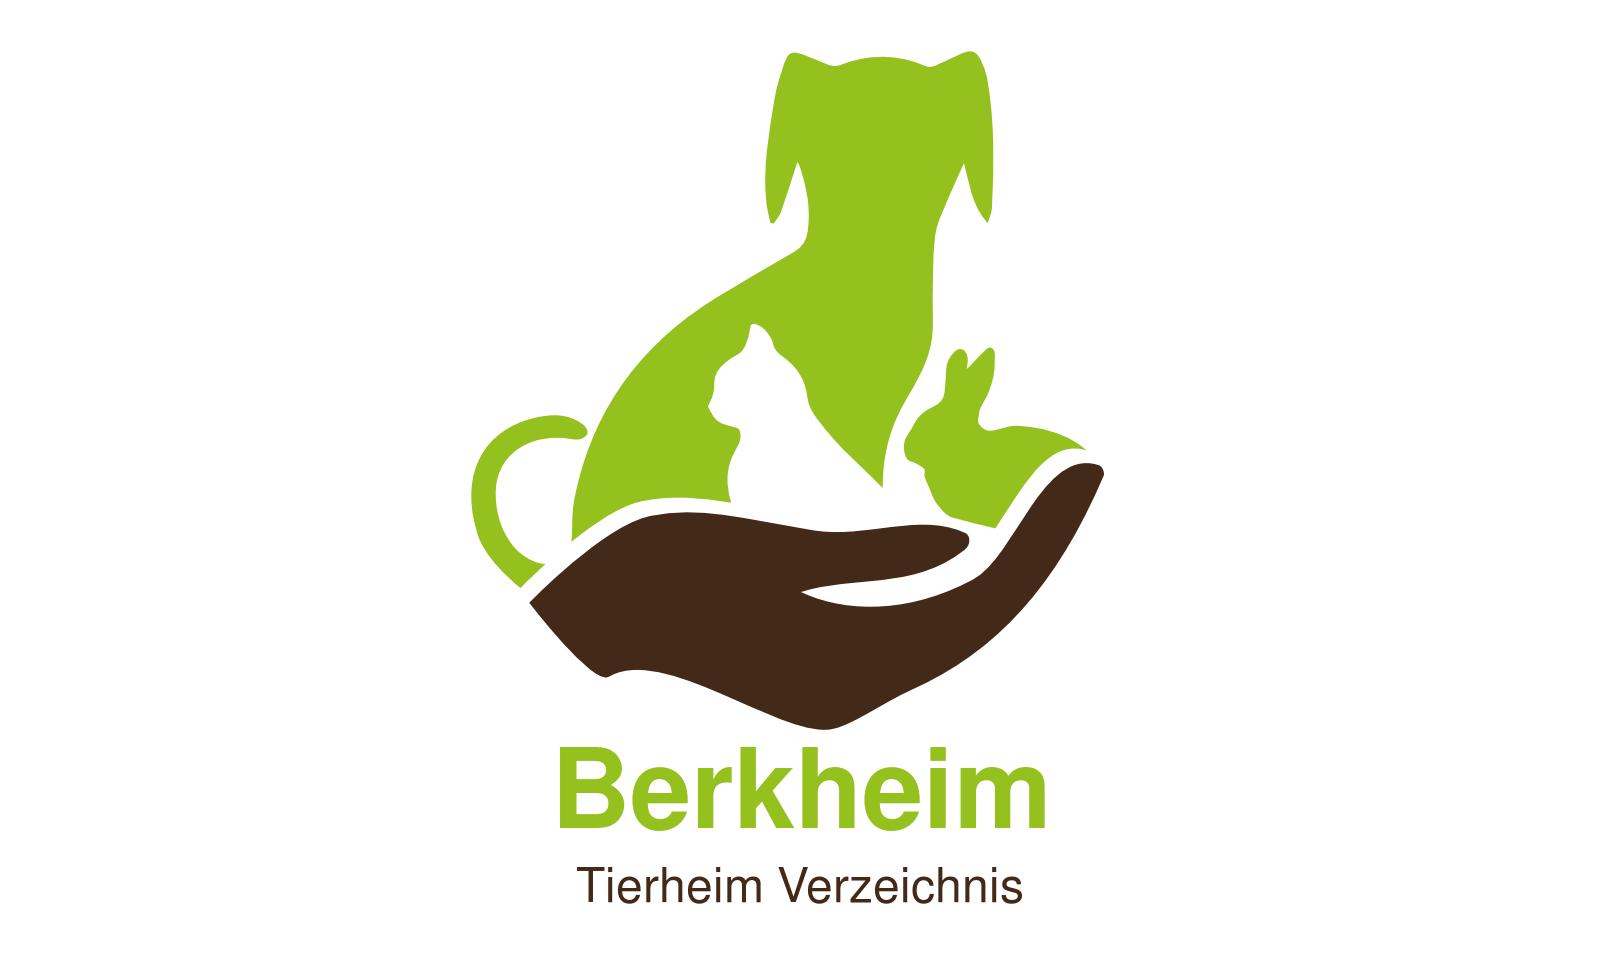 Tierheim Berkheim